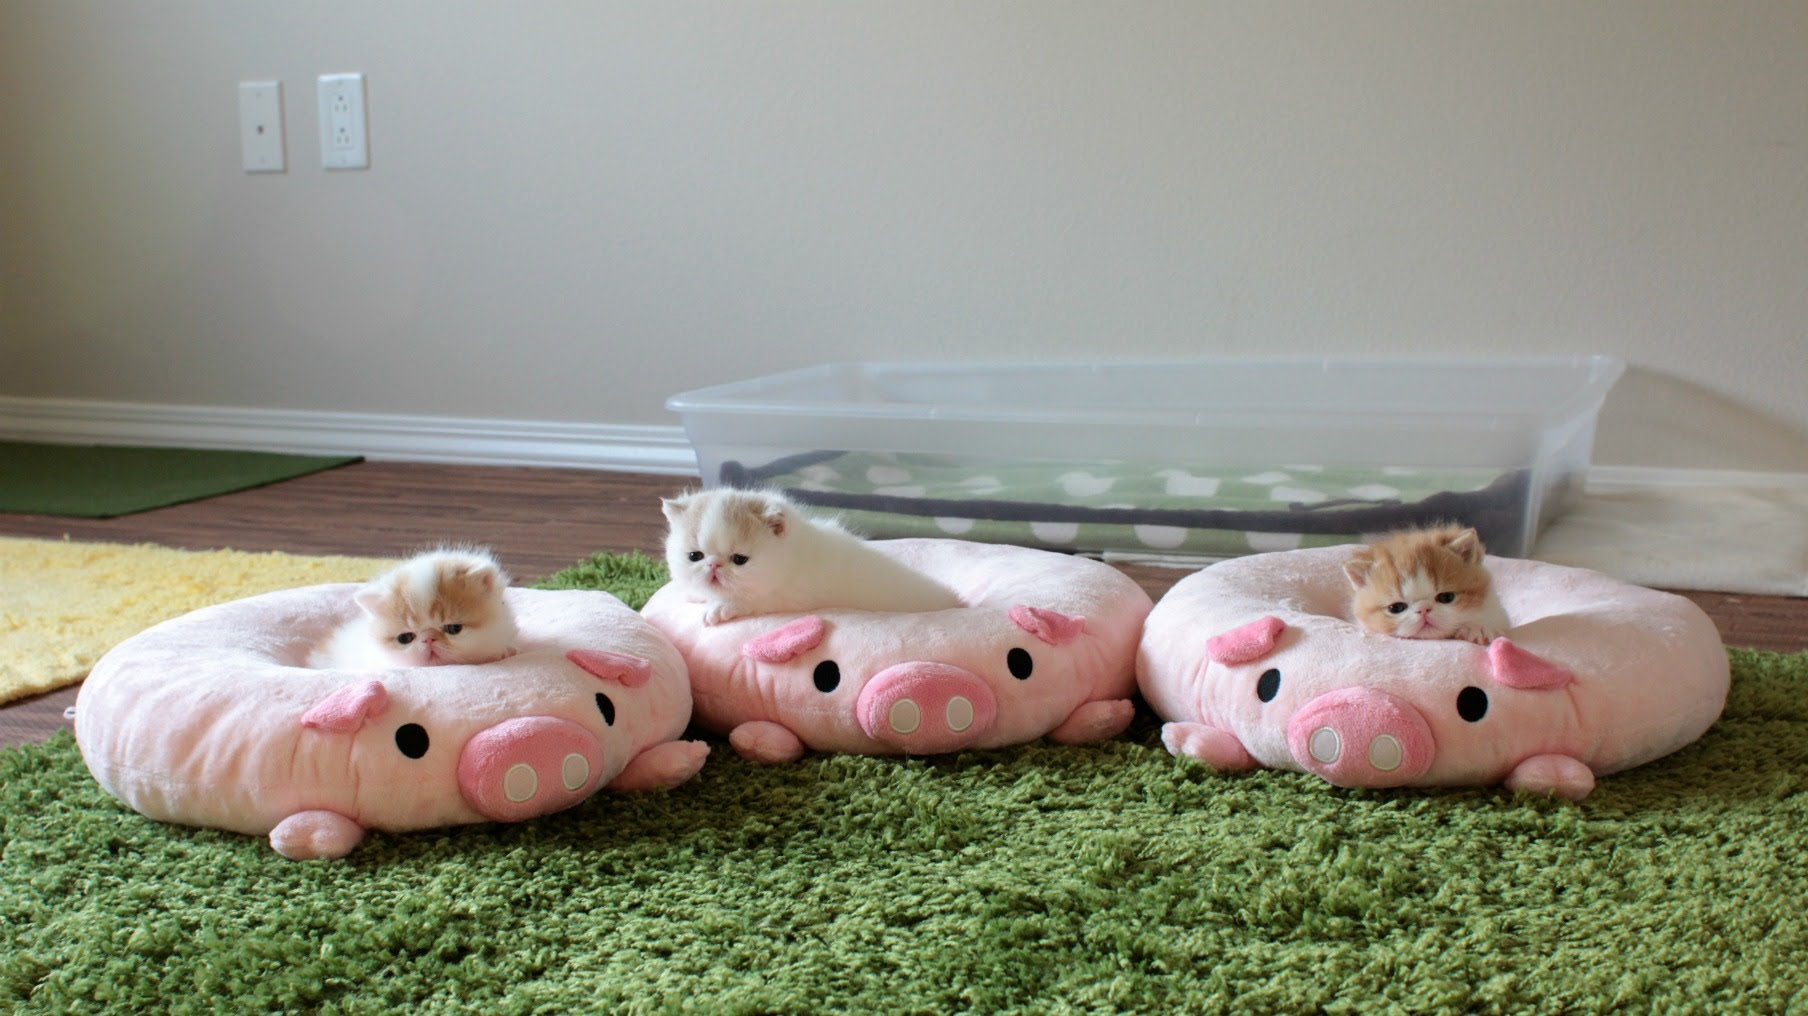 Three Little Kittens Sitting Pretty On Plush Pig Cushions